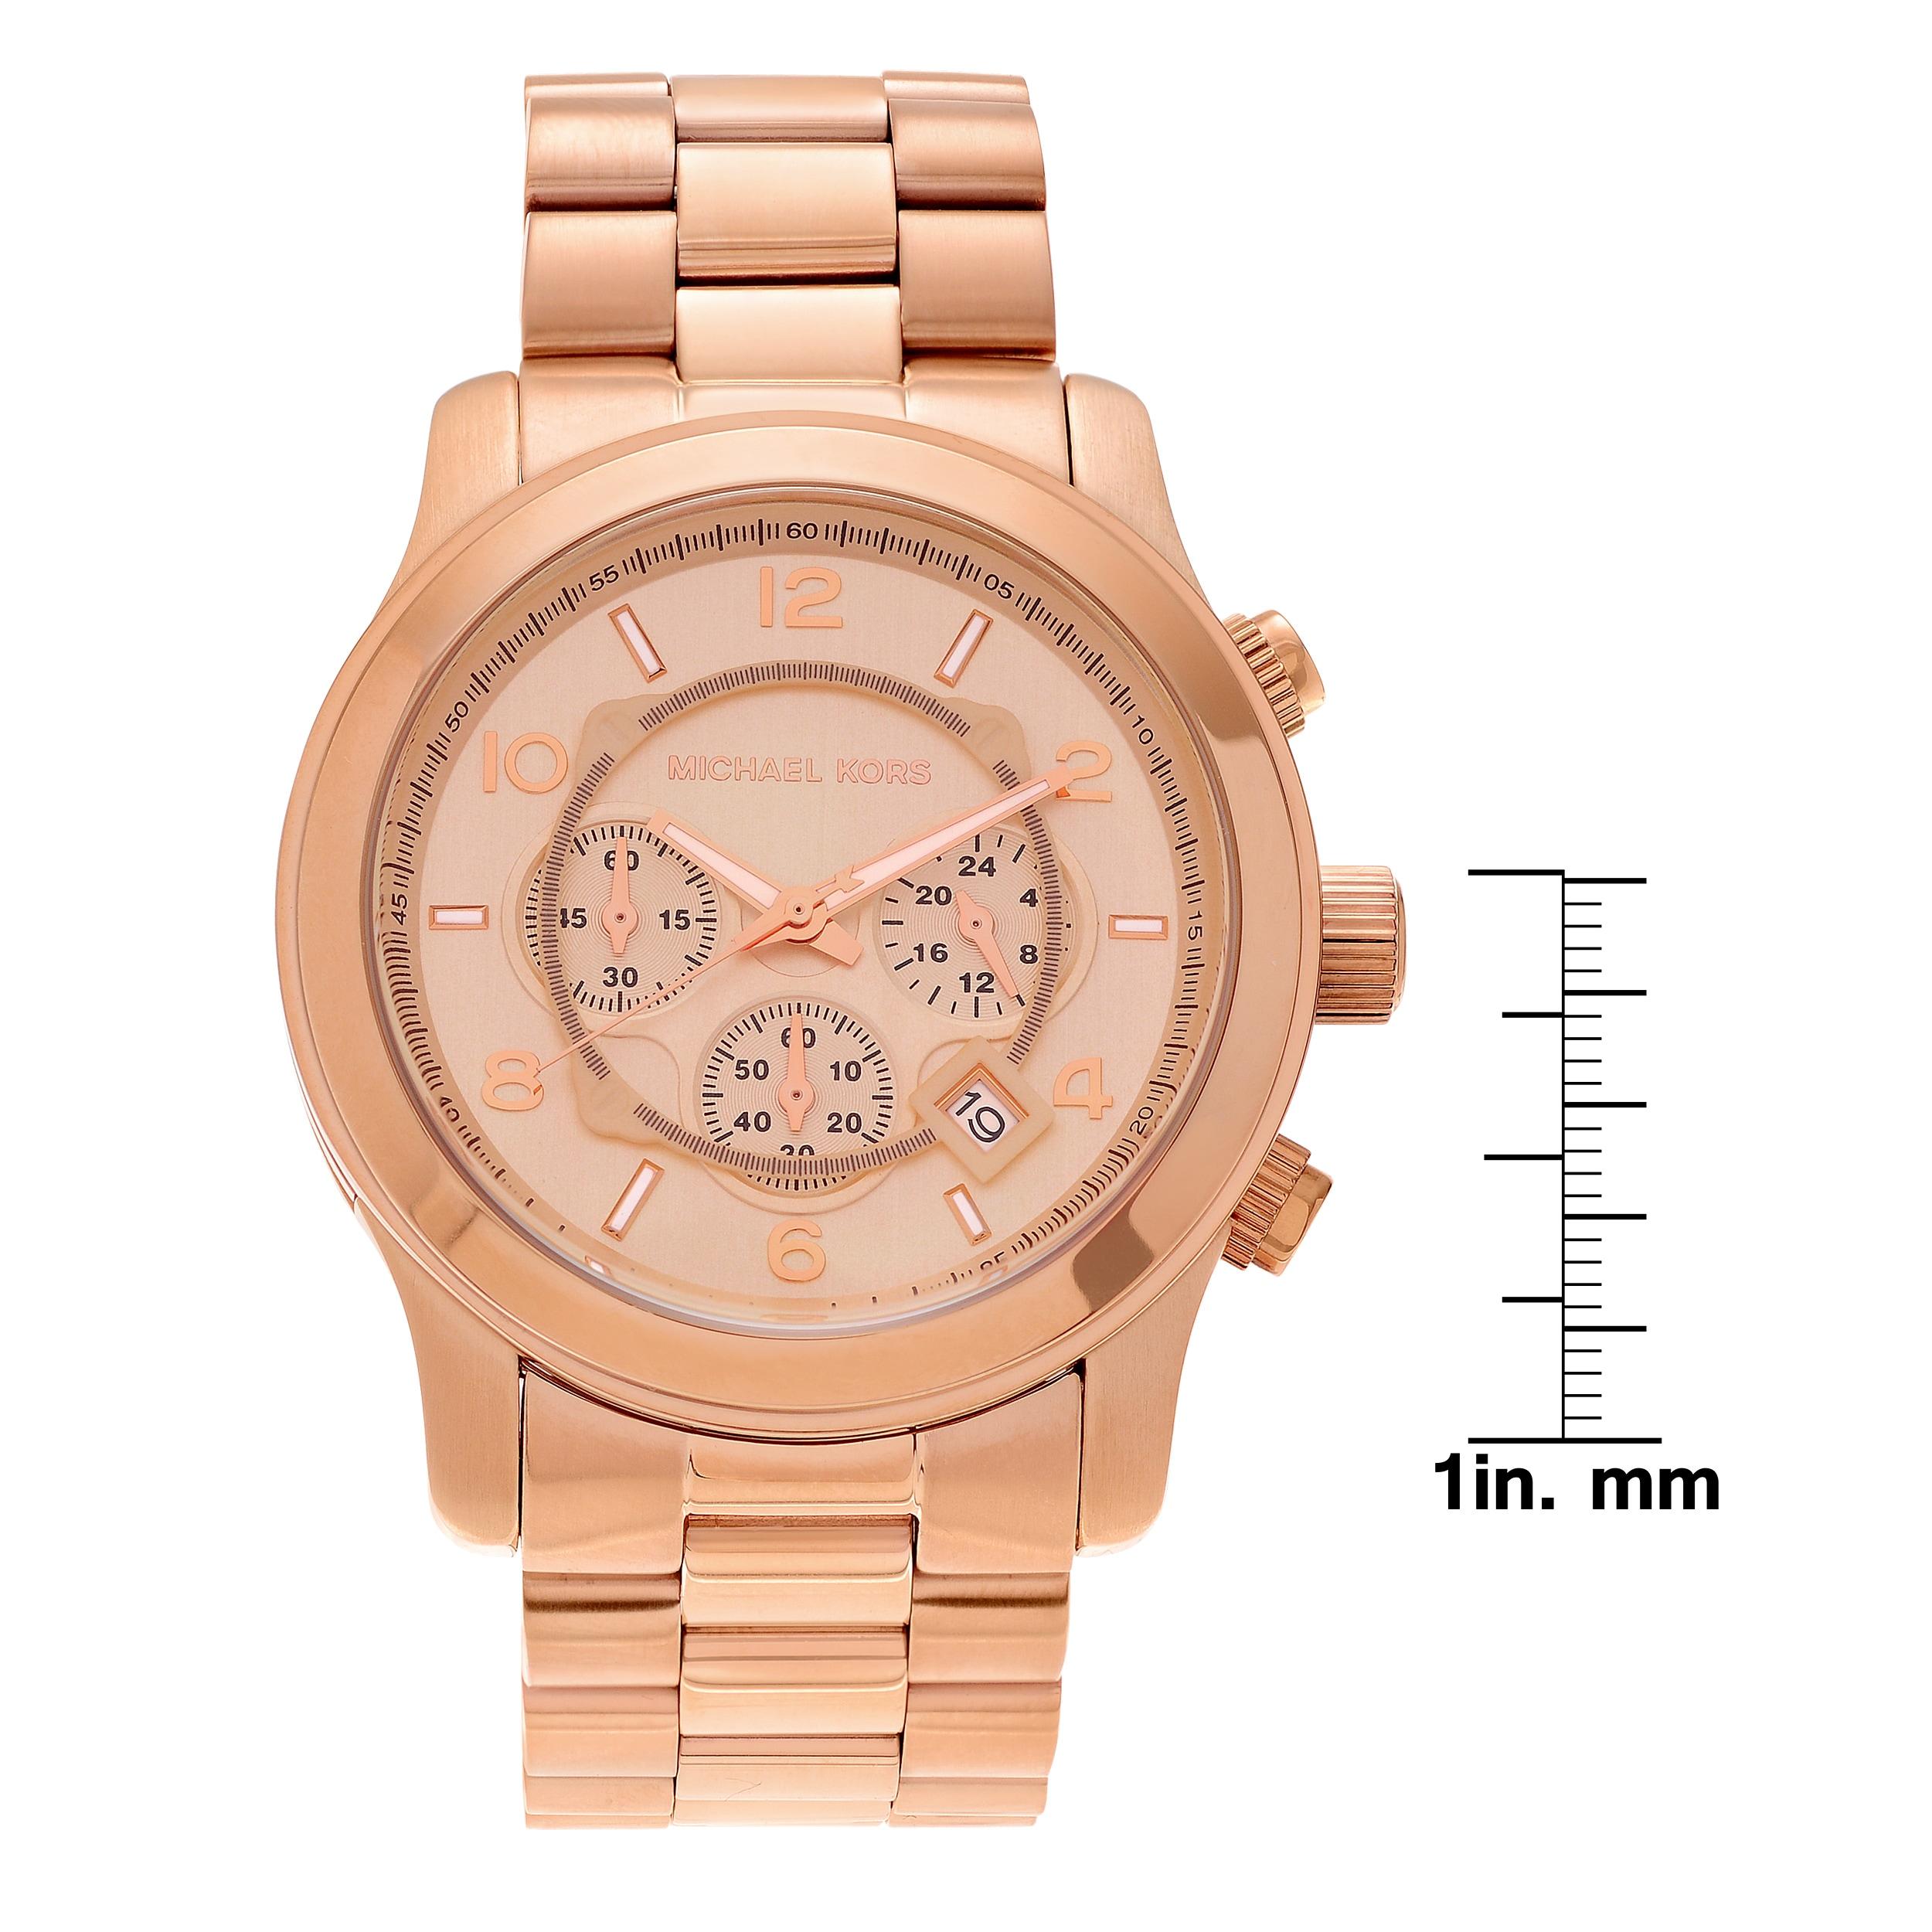 bd14a6ba3d3b Shop Michael Kors Men s MK8096  Runway  Rose Gold-Tone Watch - Gold - Free  Shipping Today - Overstock - 5716192